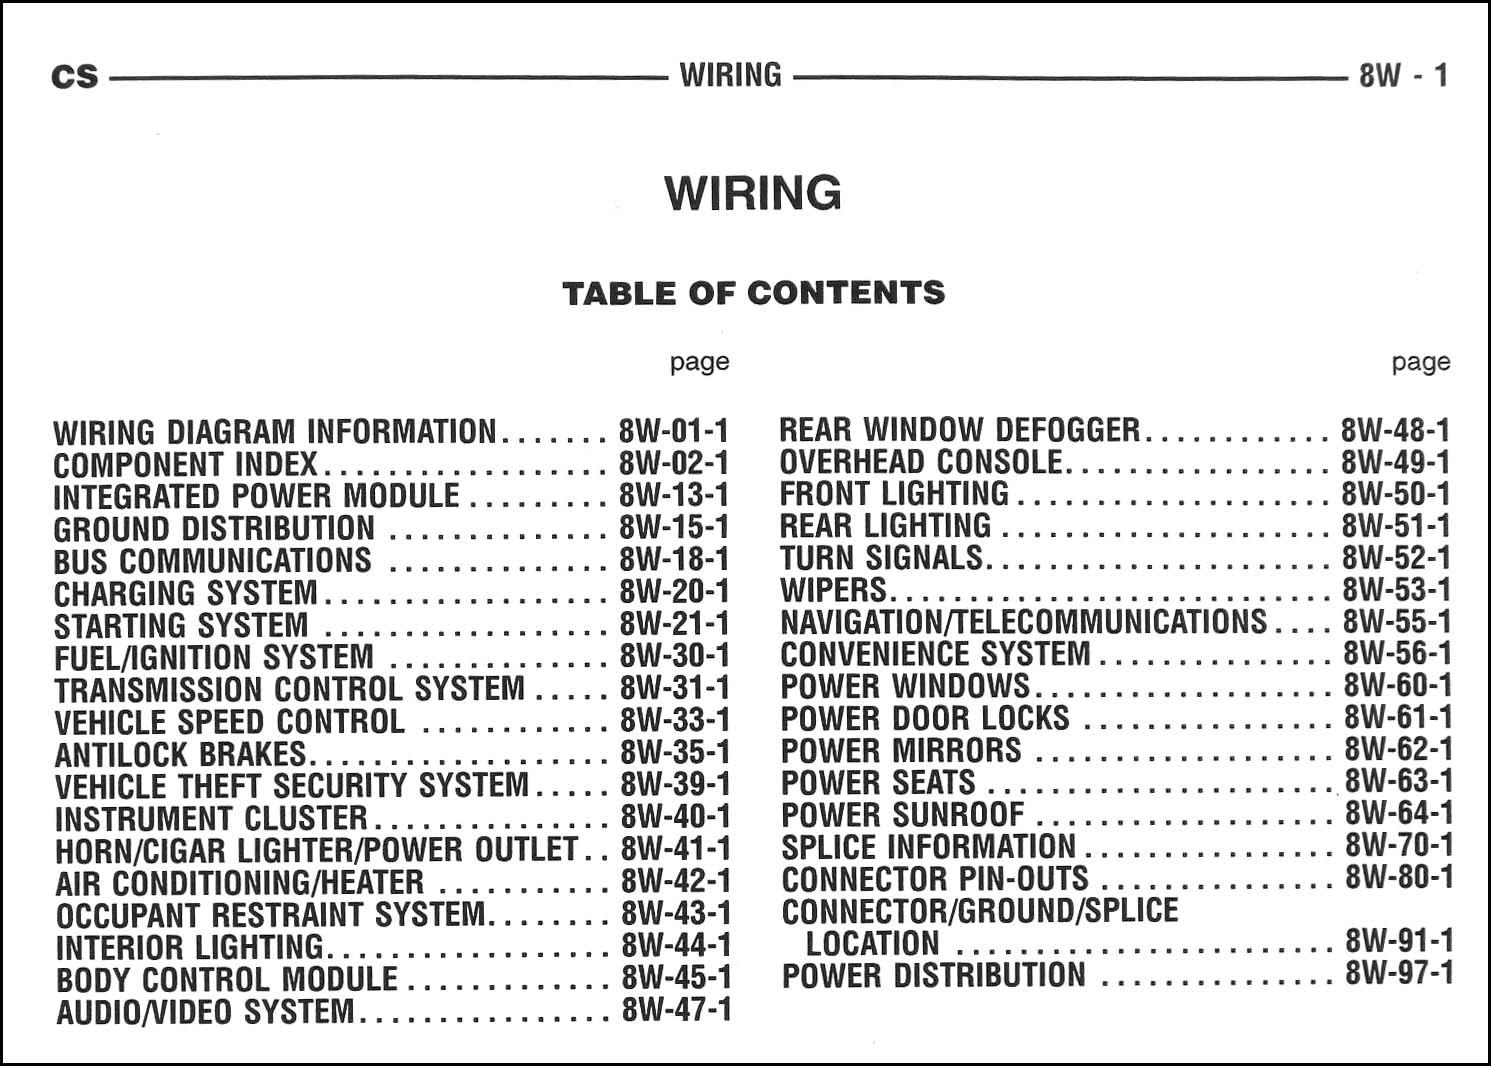 chrysler 300 wiring diagrams hpm fan diagram 2005 fuse box get free image about